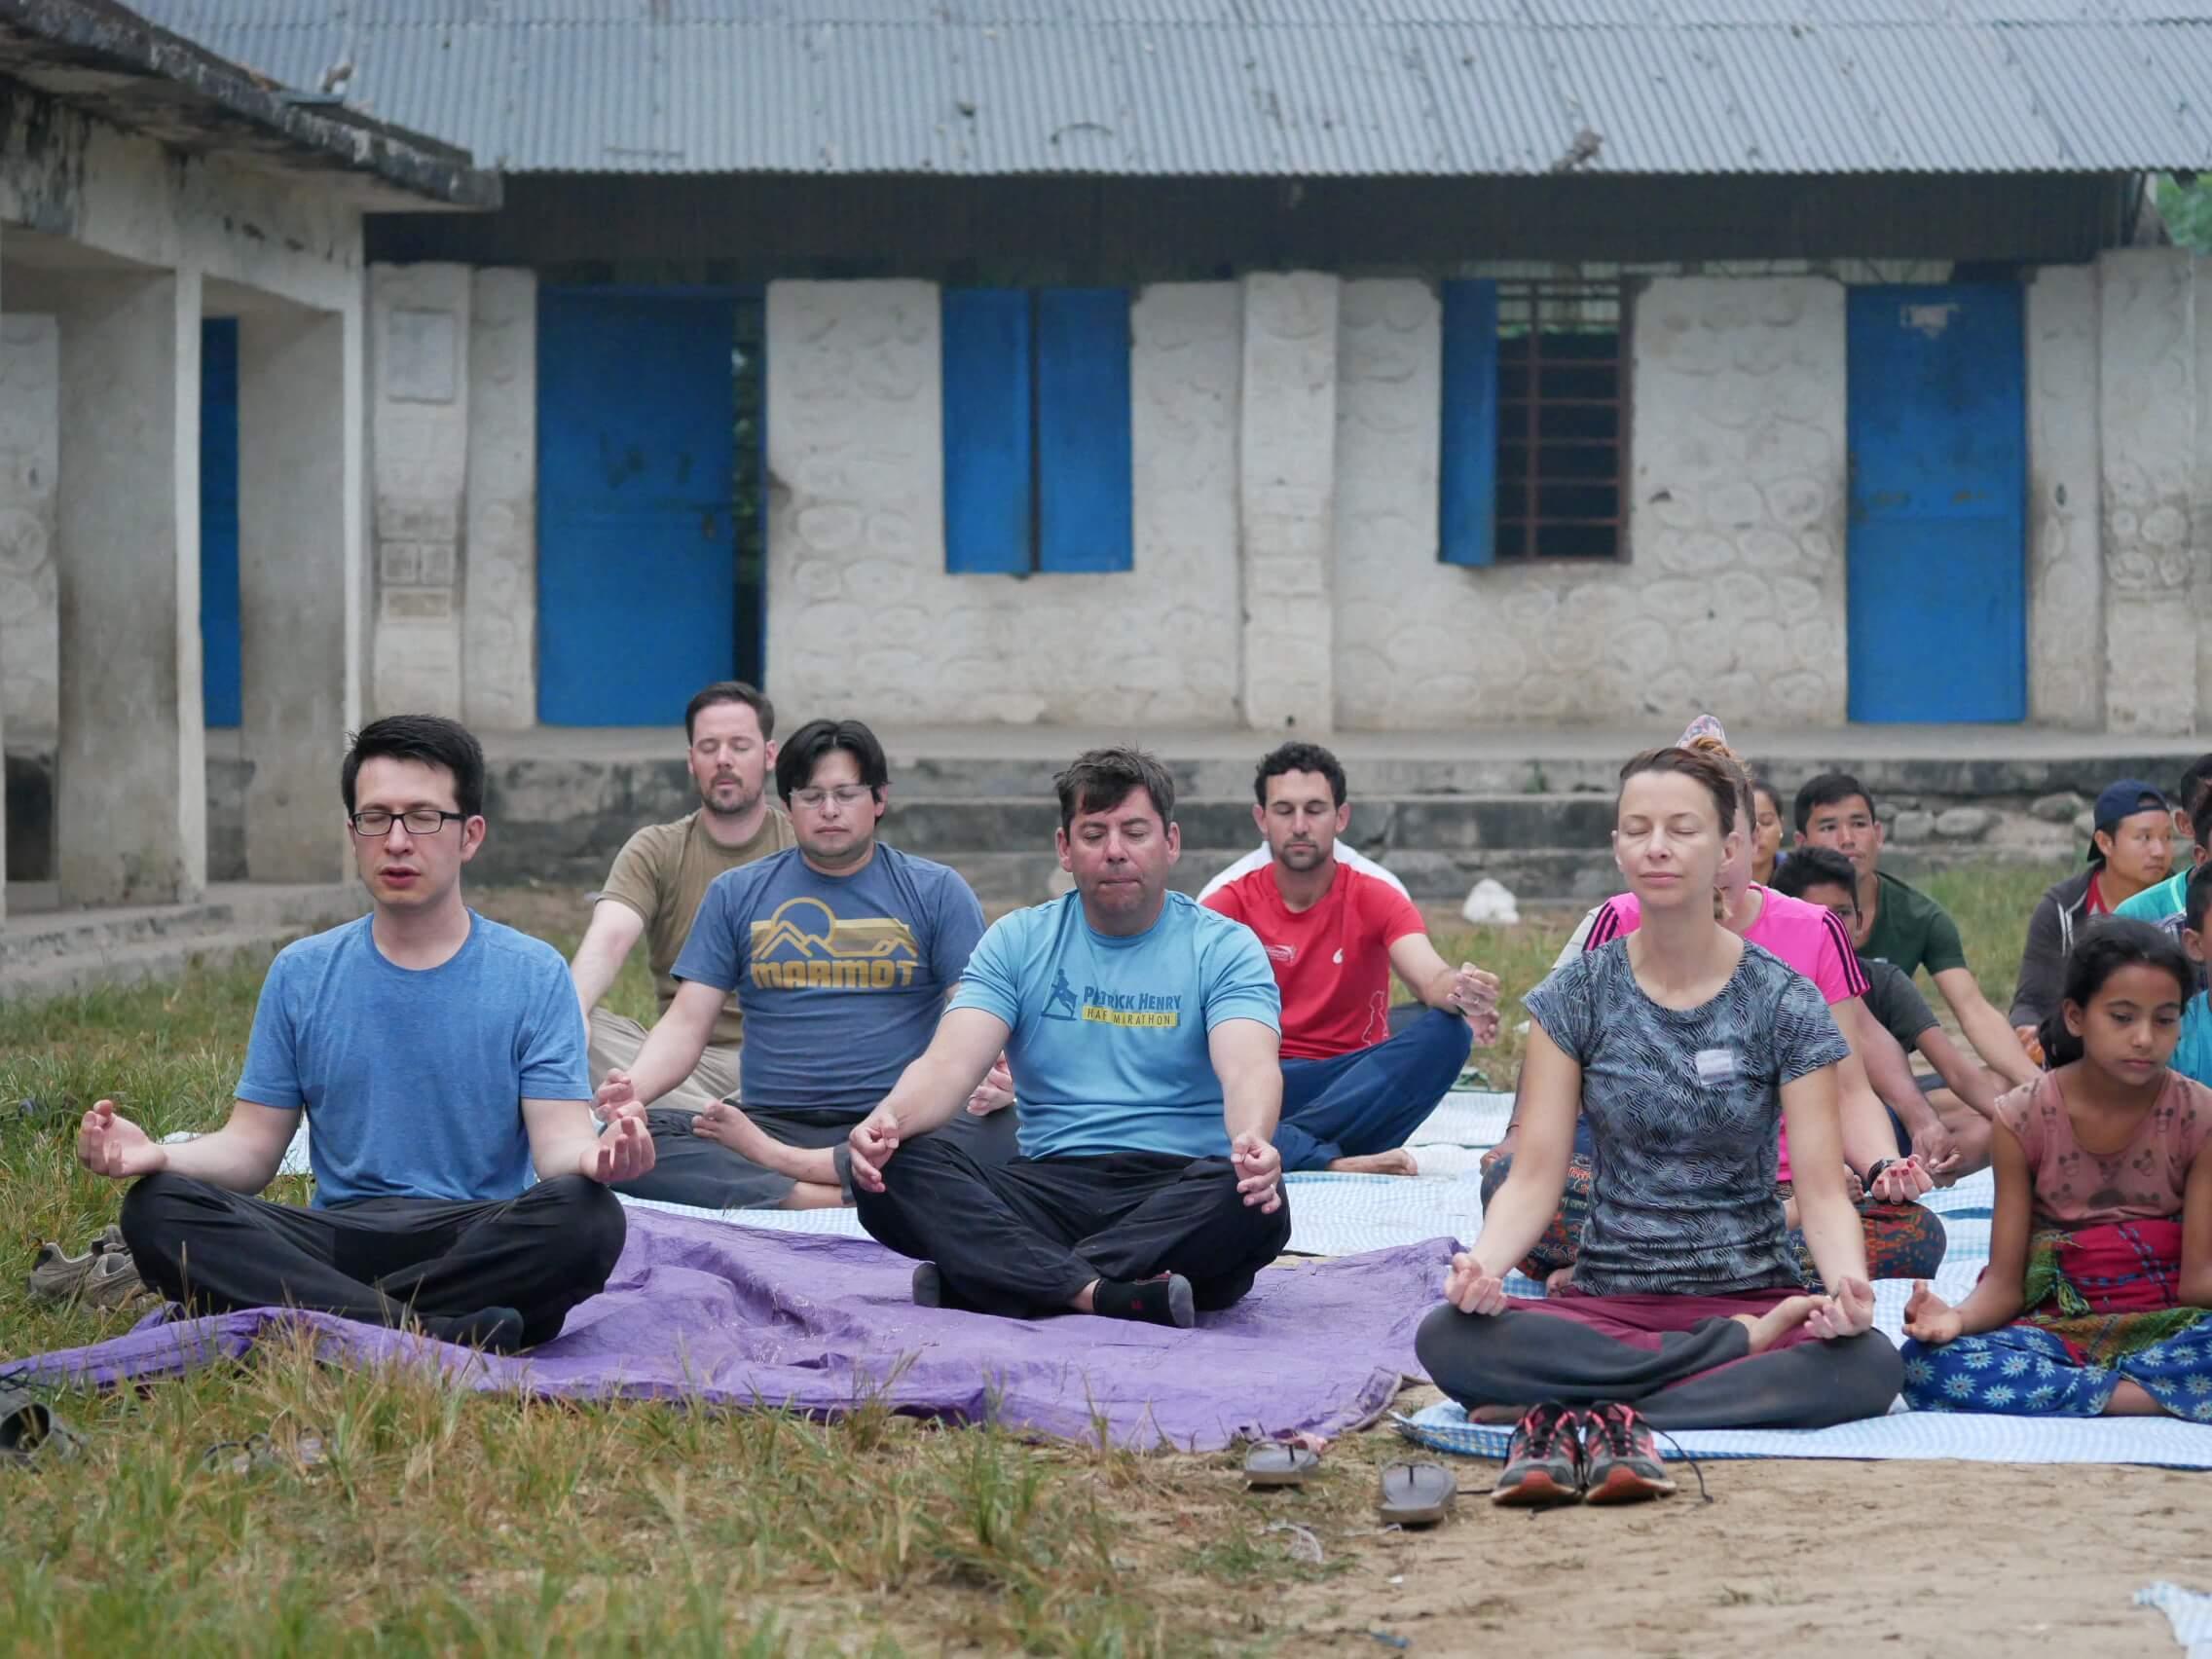 Arturo Bustamante and group on their buildOn trek to Kuine, Nepal to break ground on a school